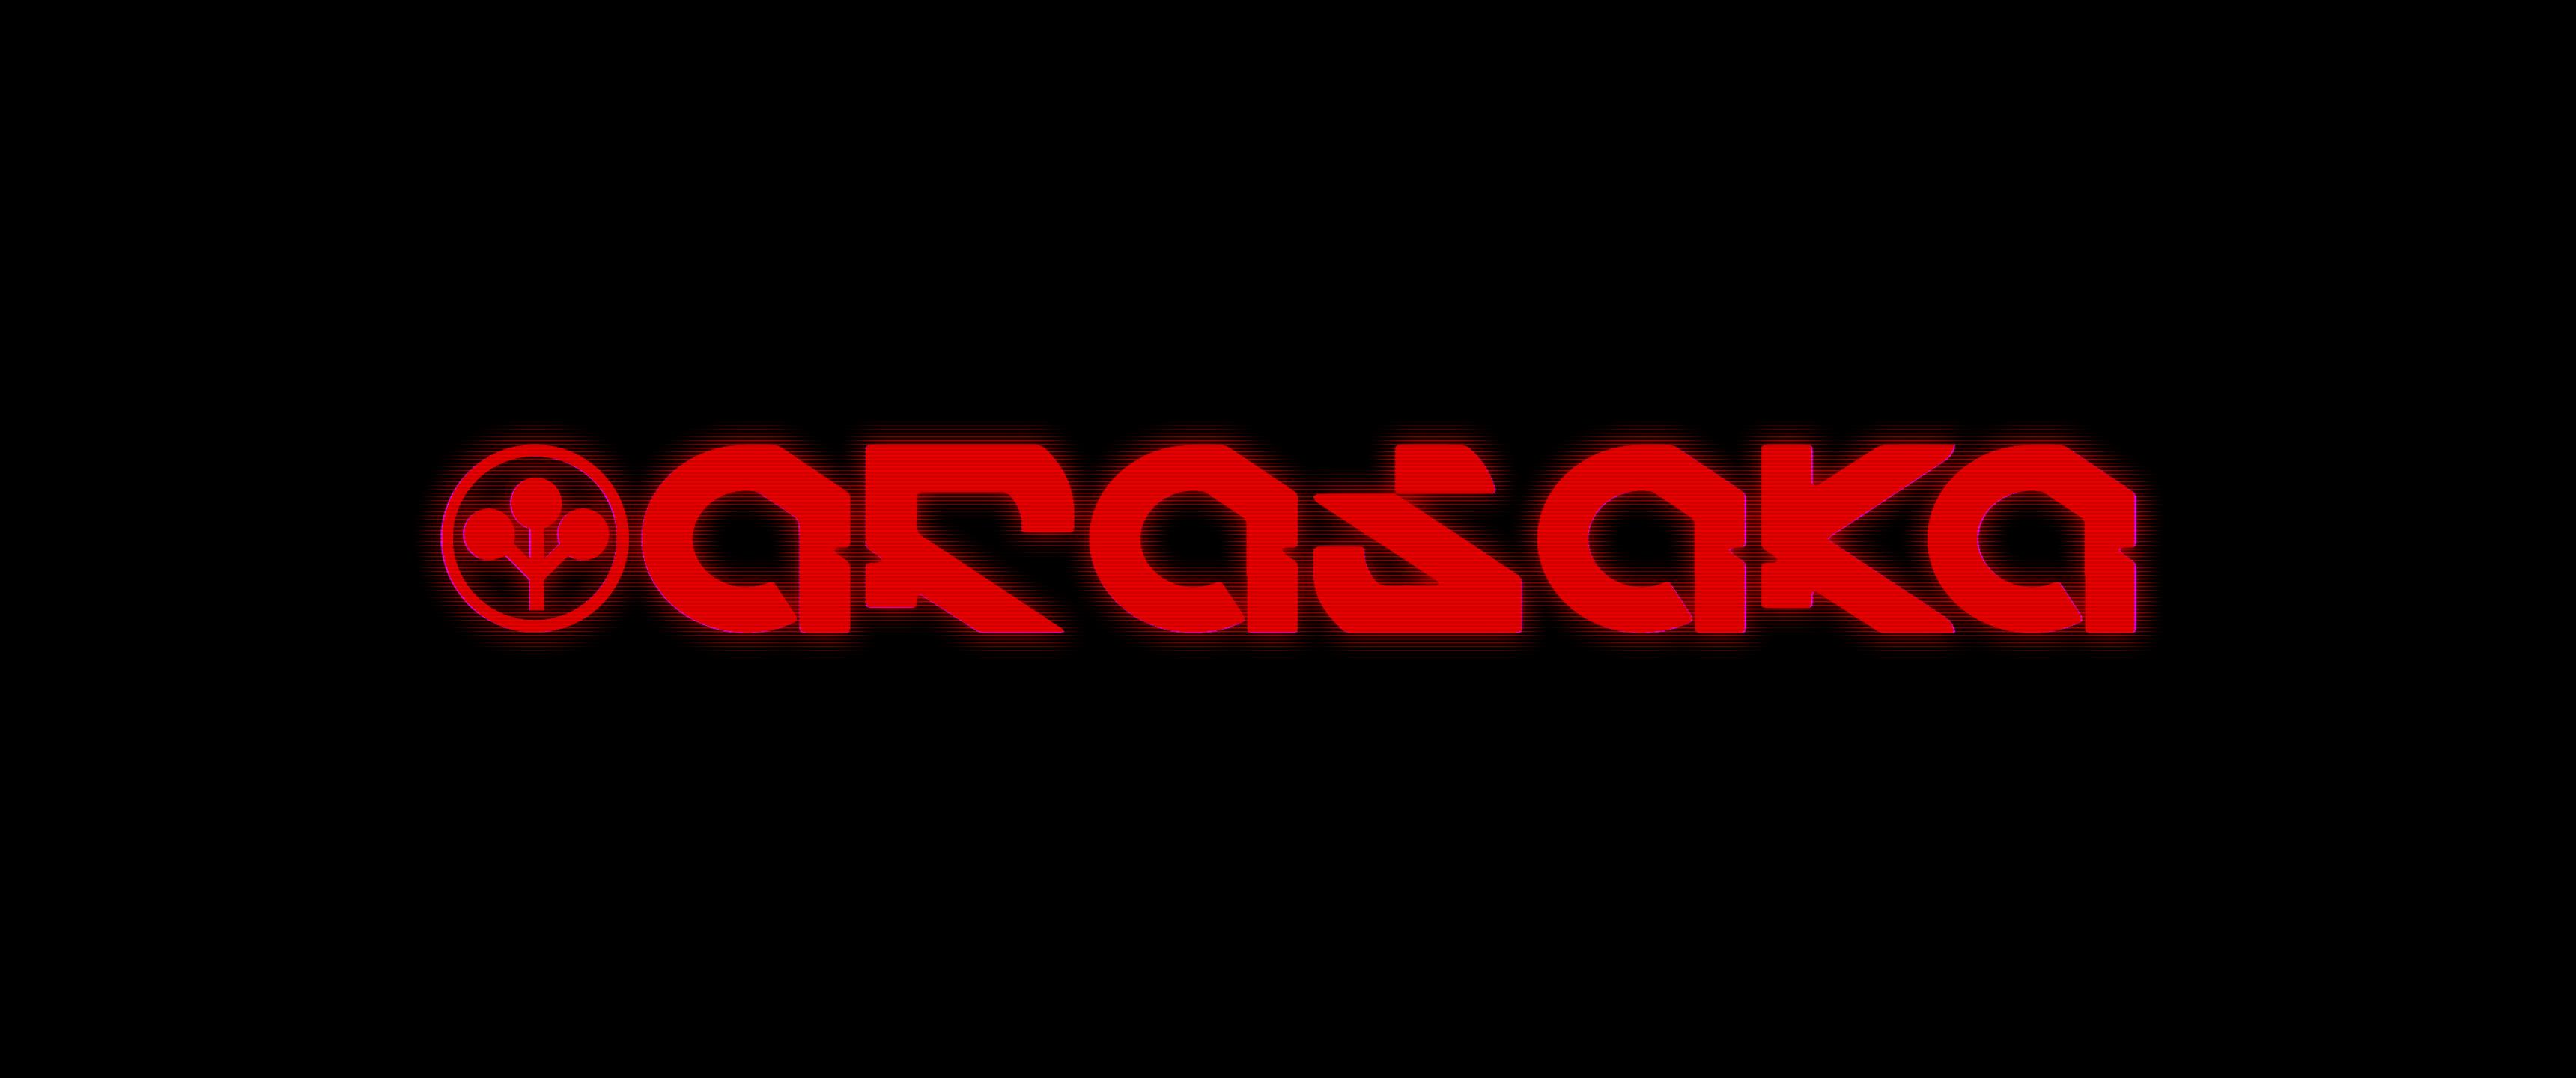 Arasaka Wallpapper.png